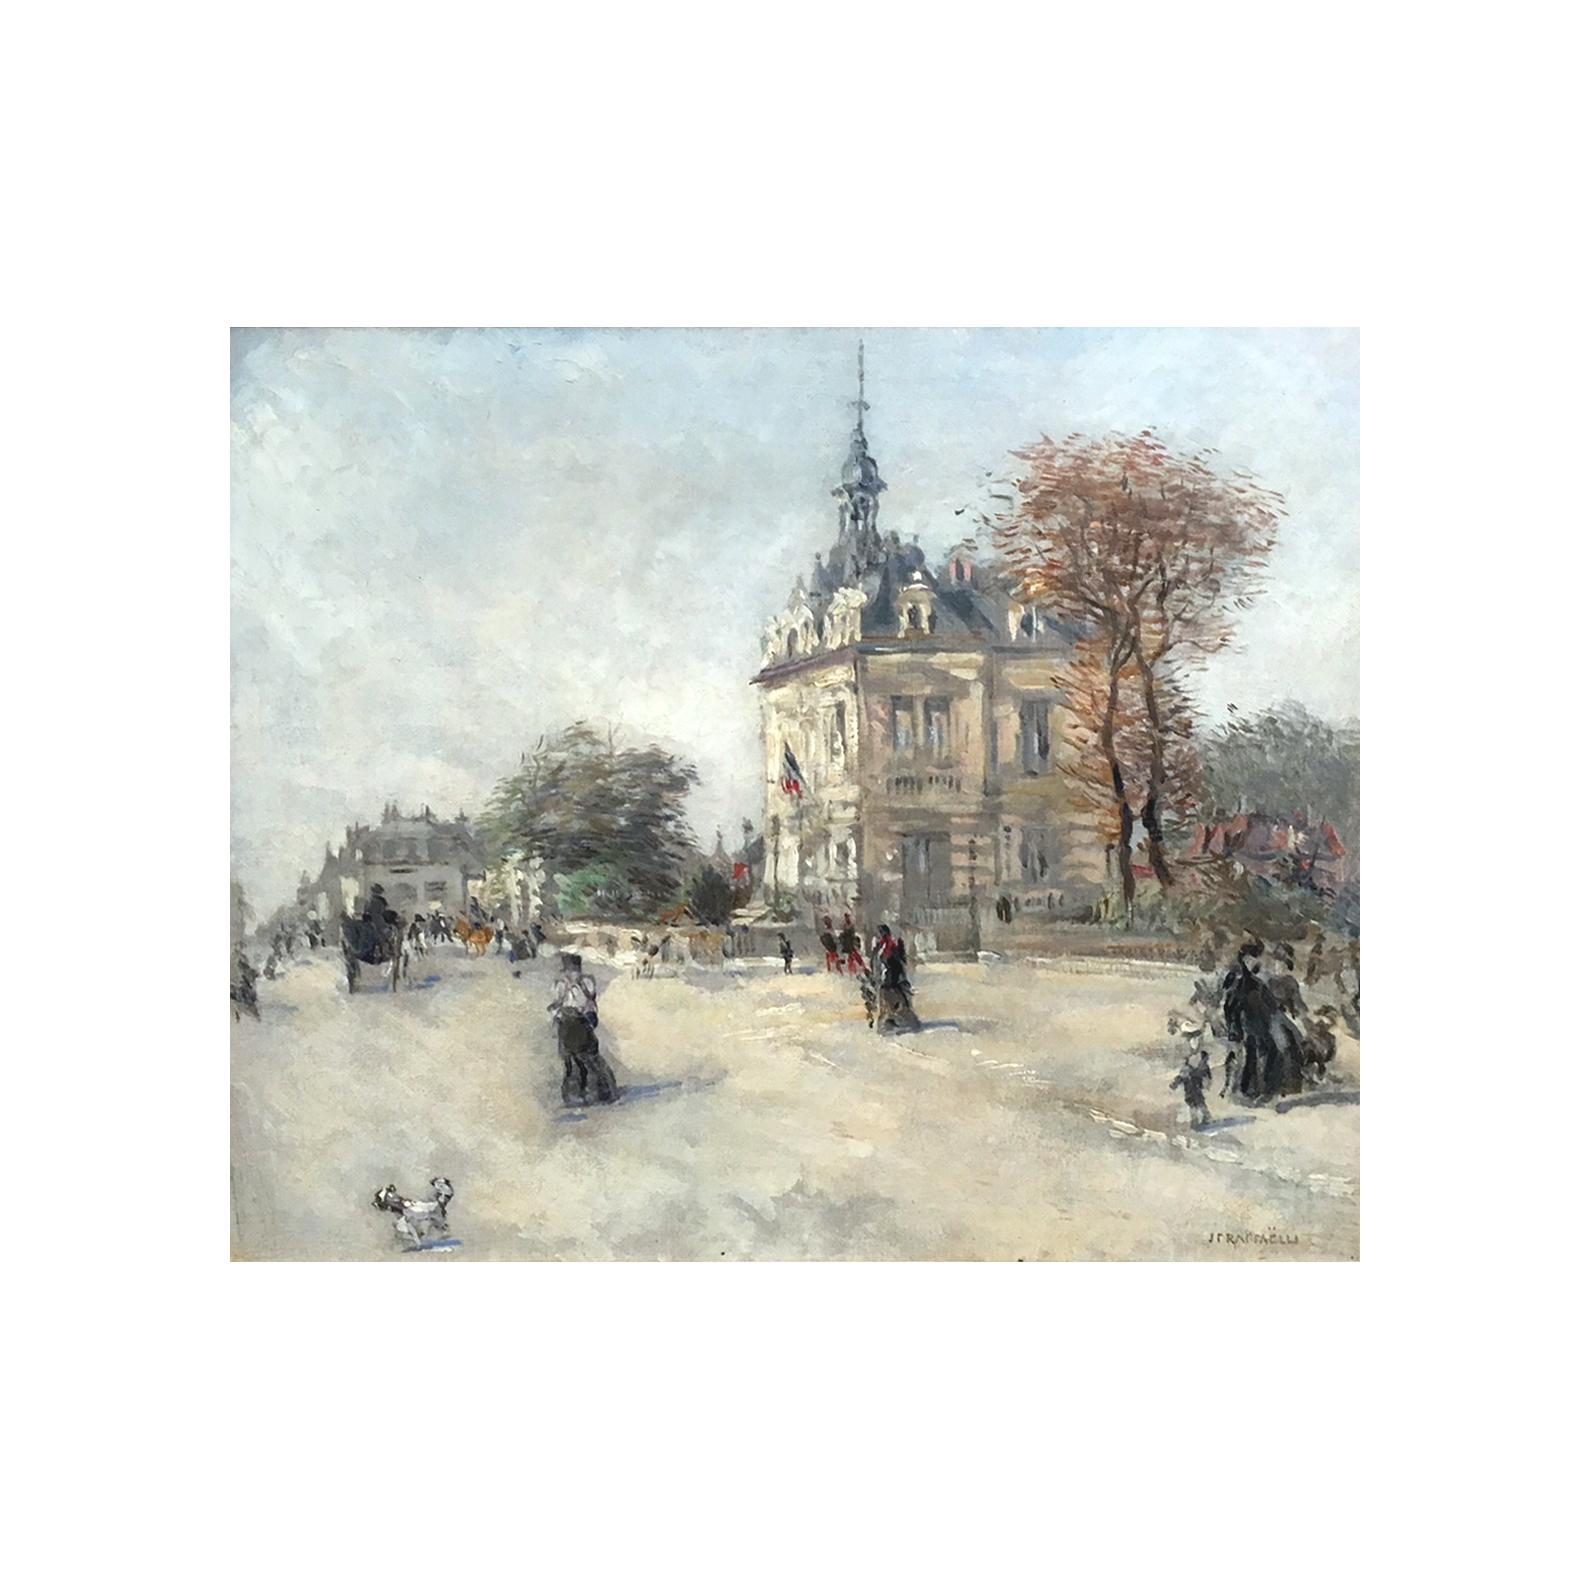 Jean Francois Raffaëlli [1850-1924] : Paris Tuileries garden (La Louvre), ca.1872.